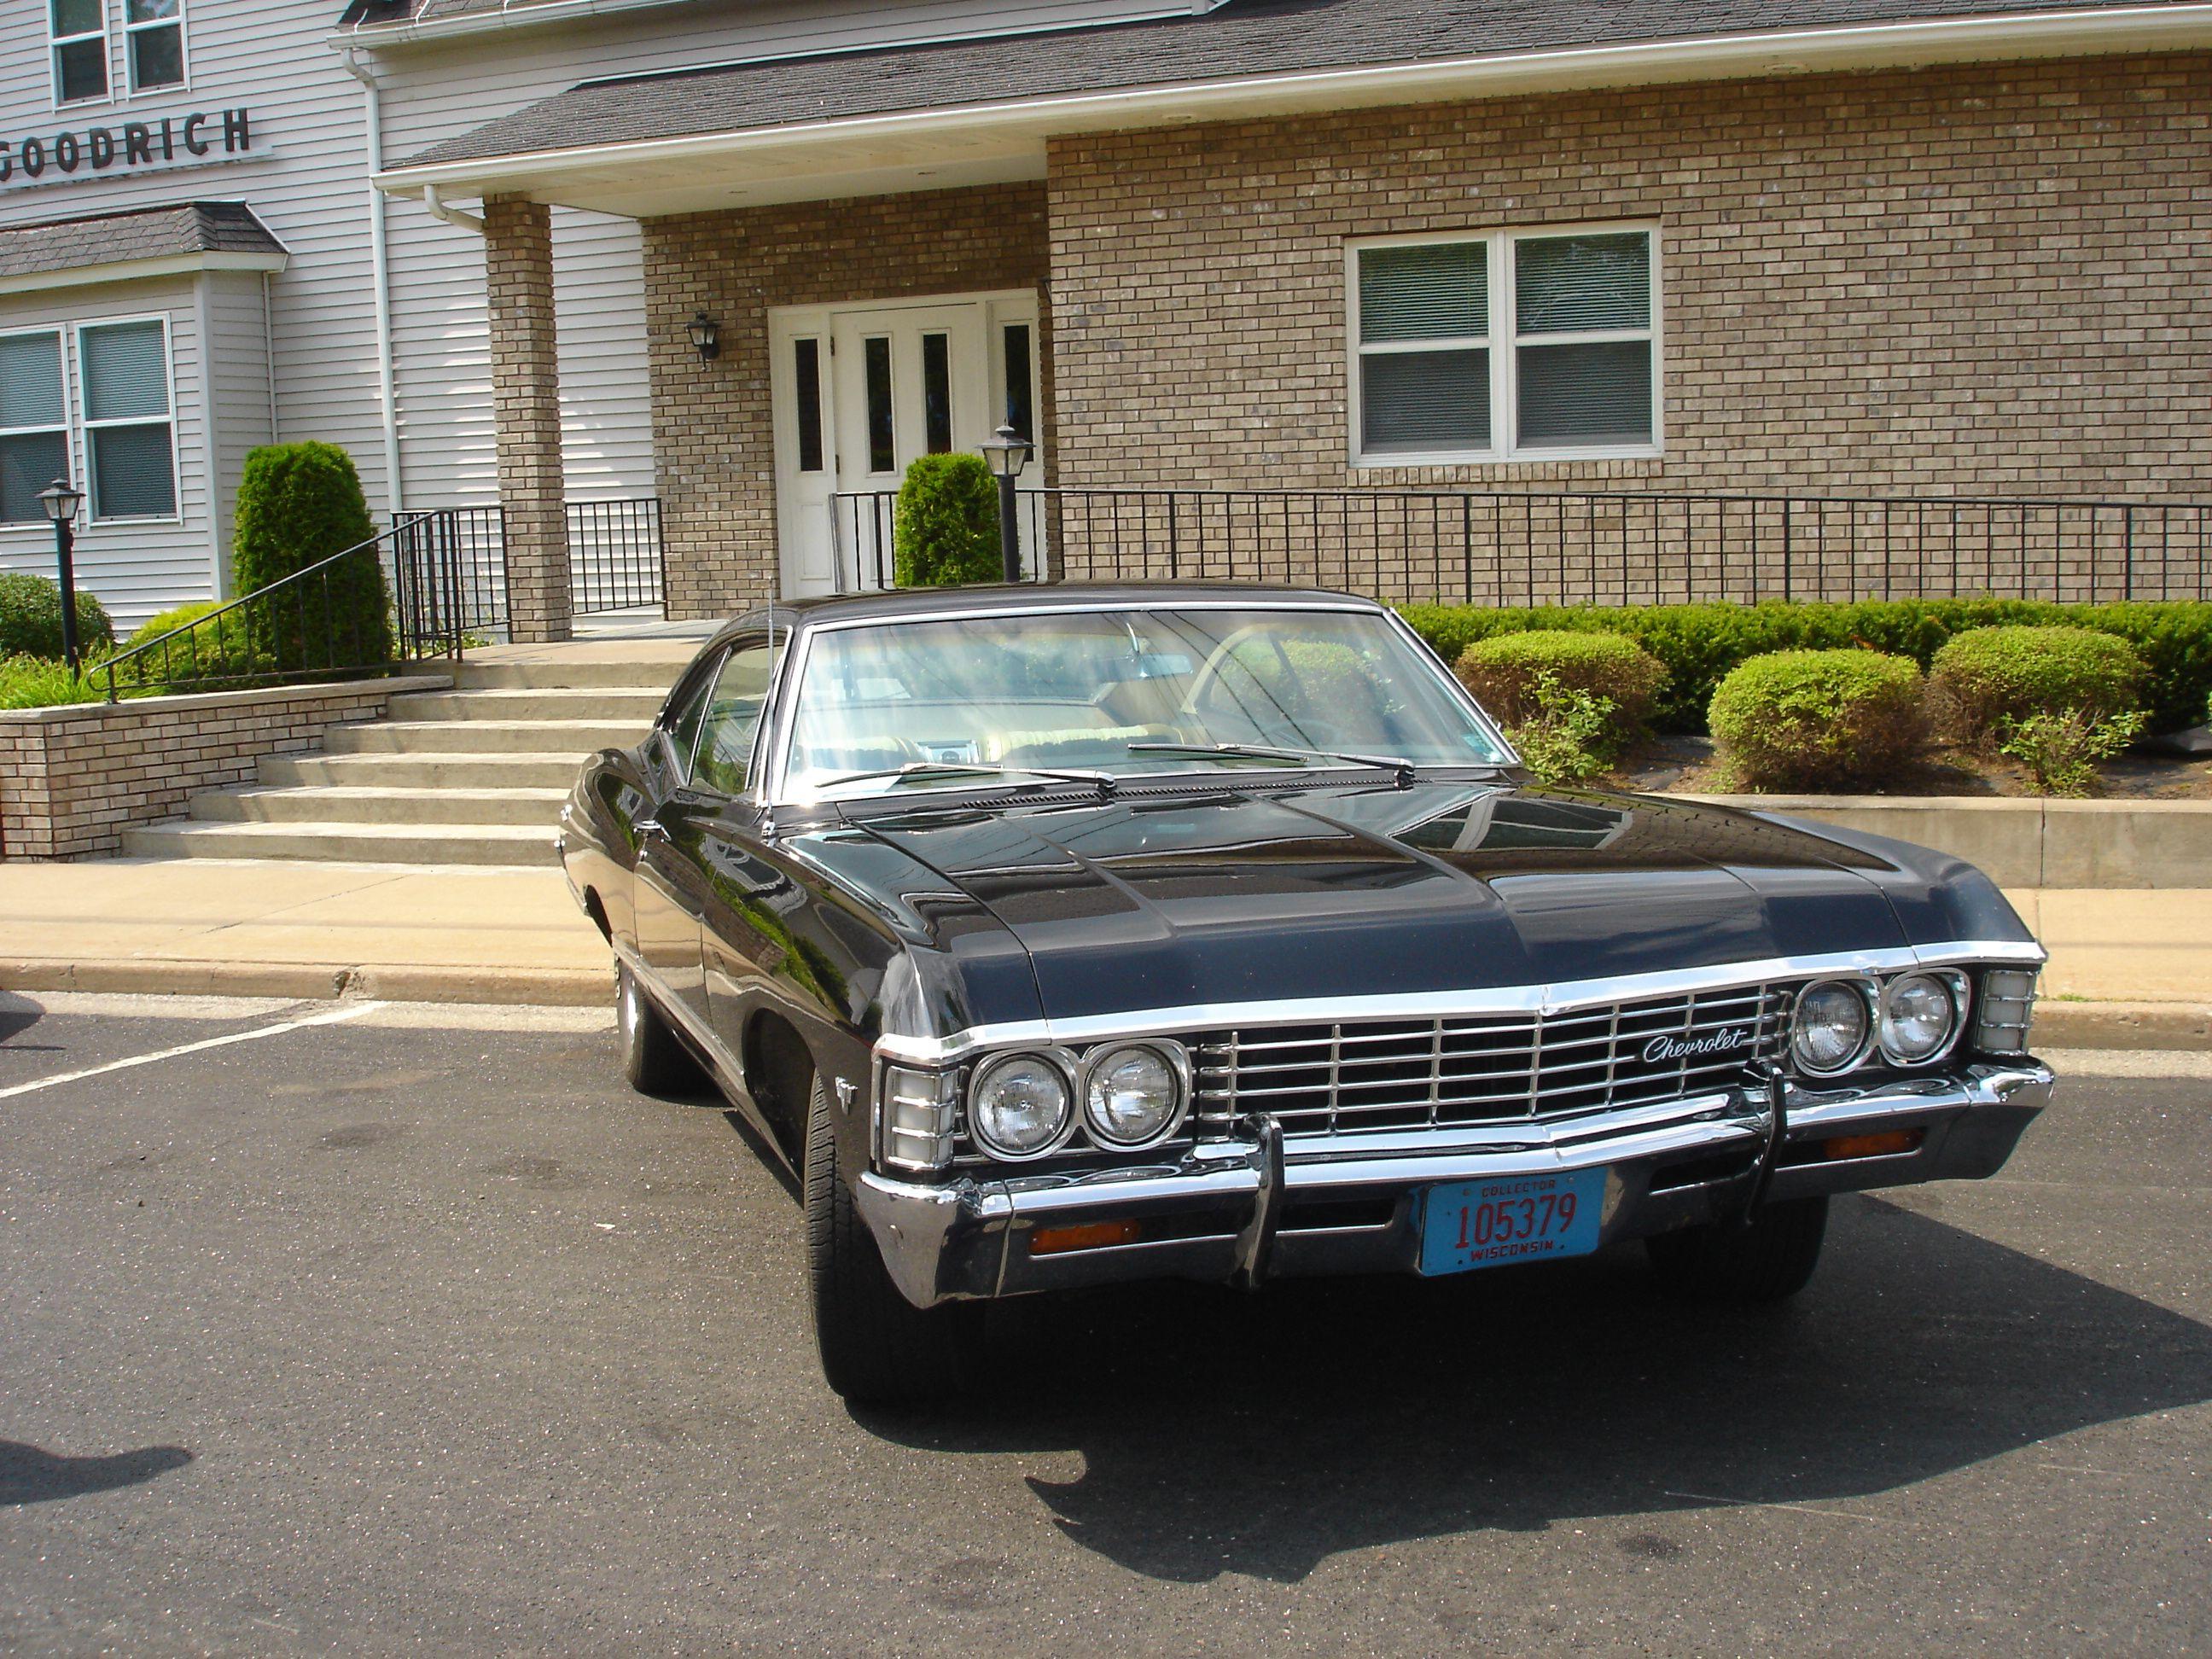 67 Chevy Impala My Dream Car Dream Cars 1967 Chevy Impala Tv Cars